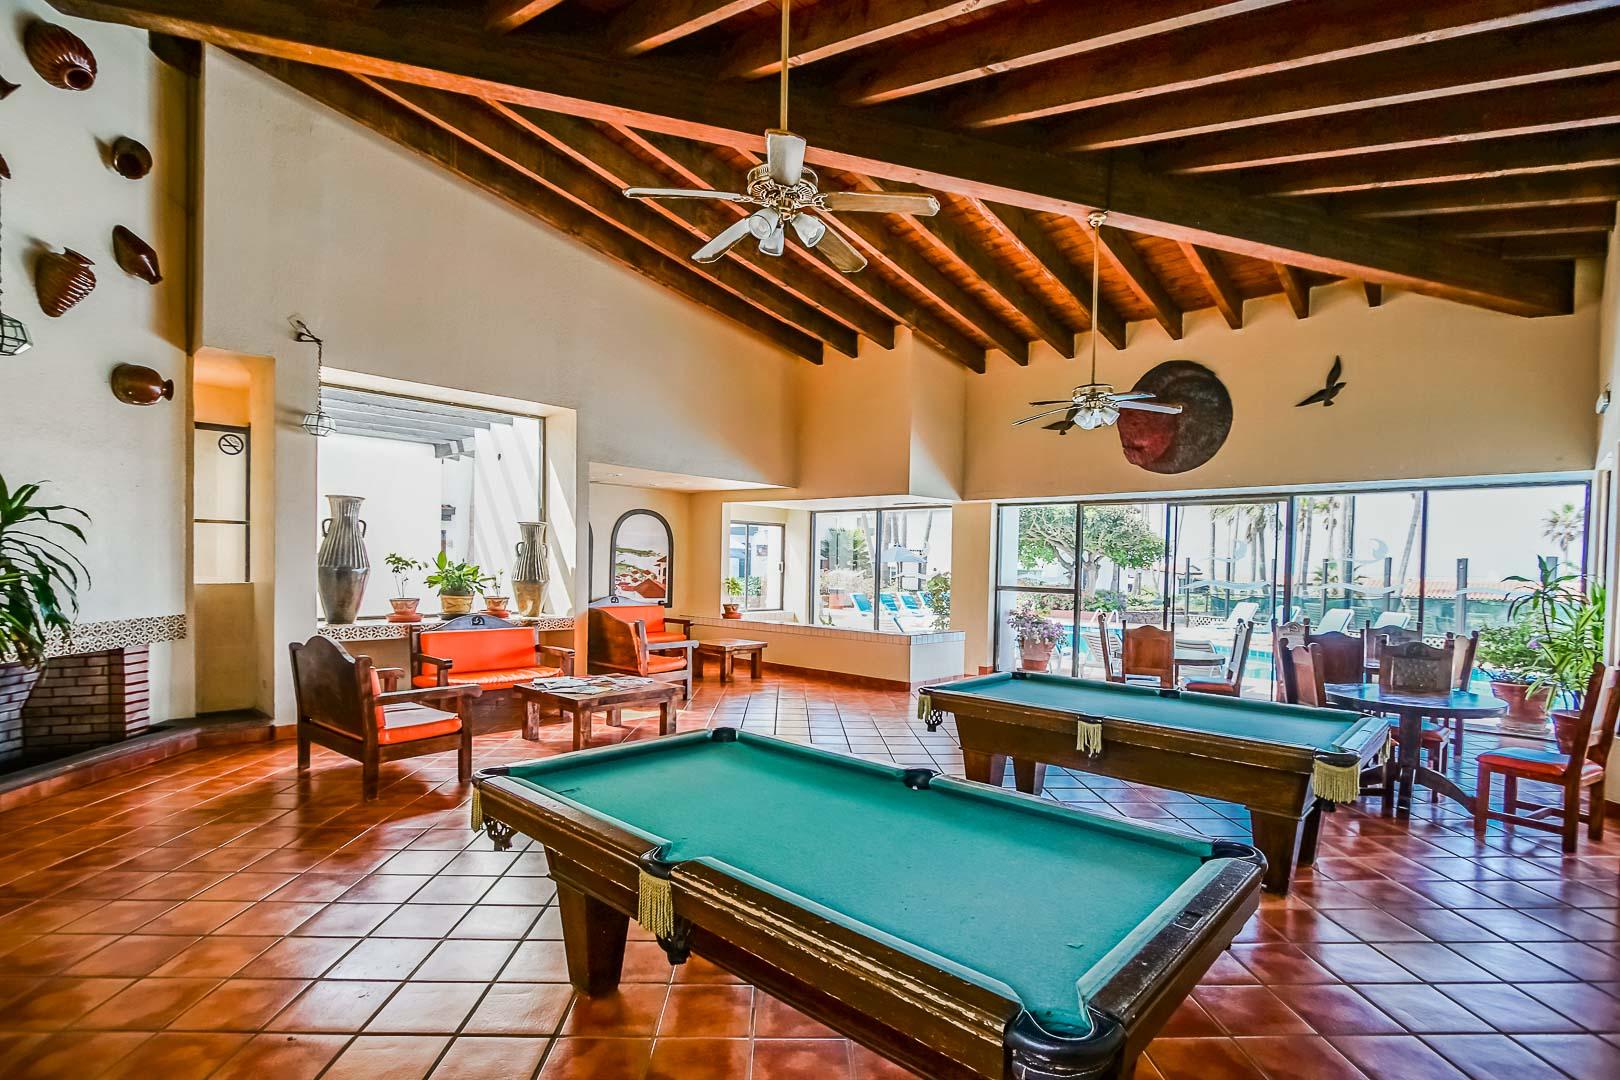 La Paloma - Pool Table